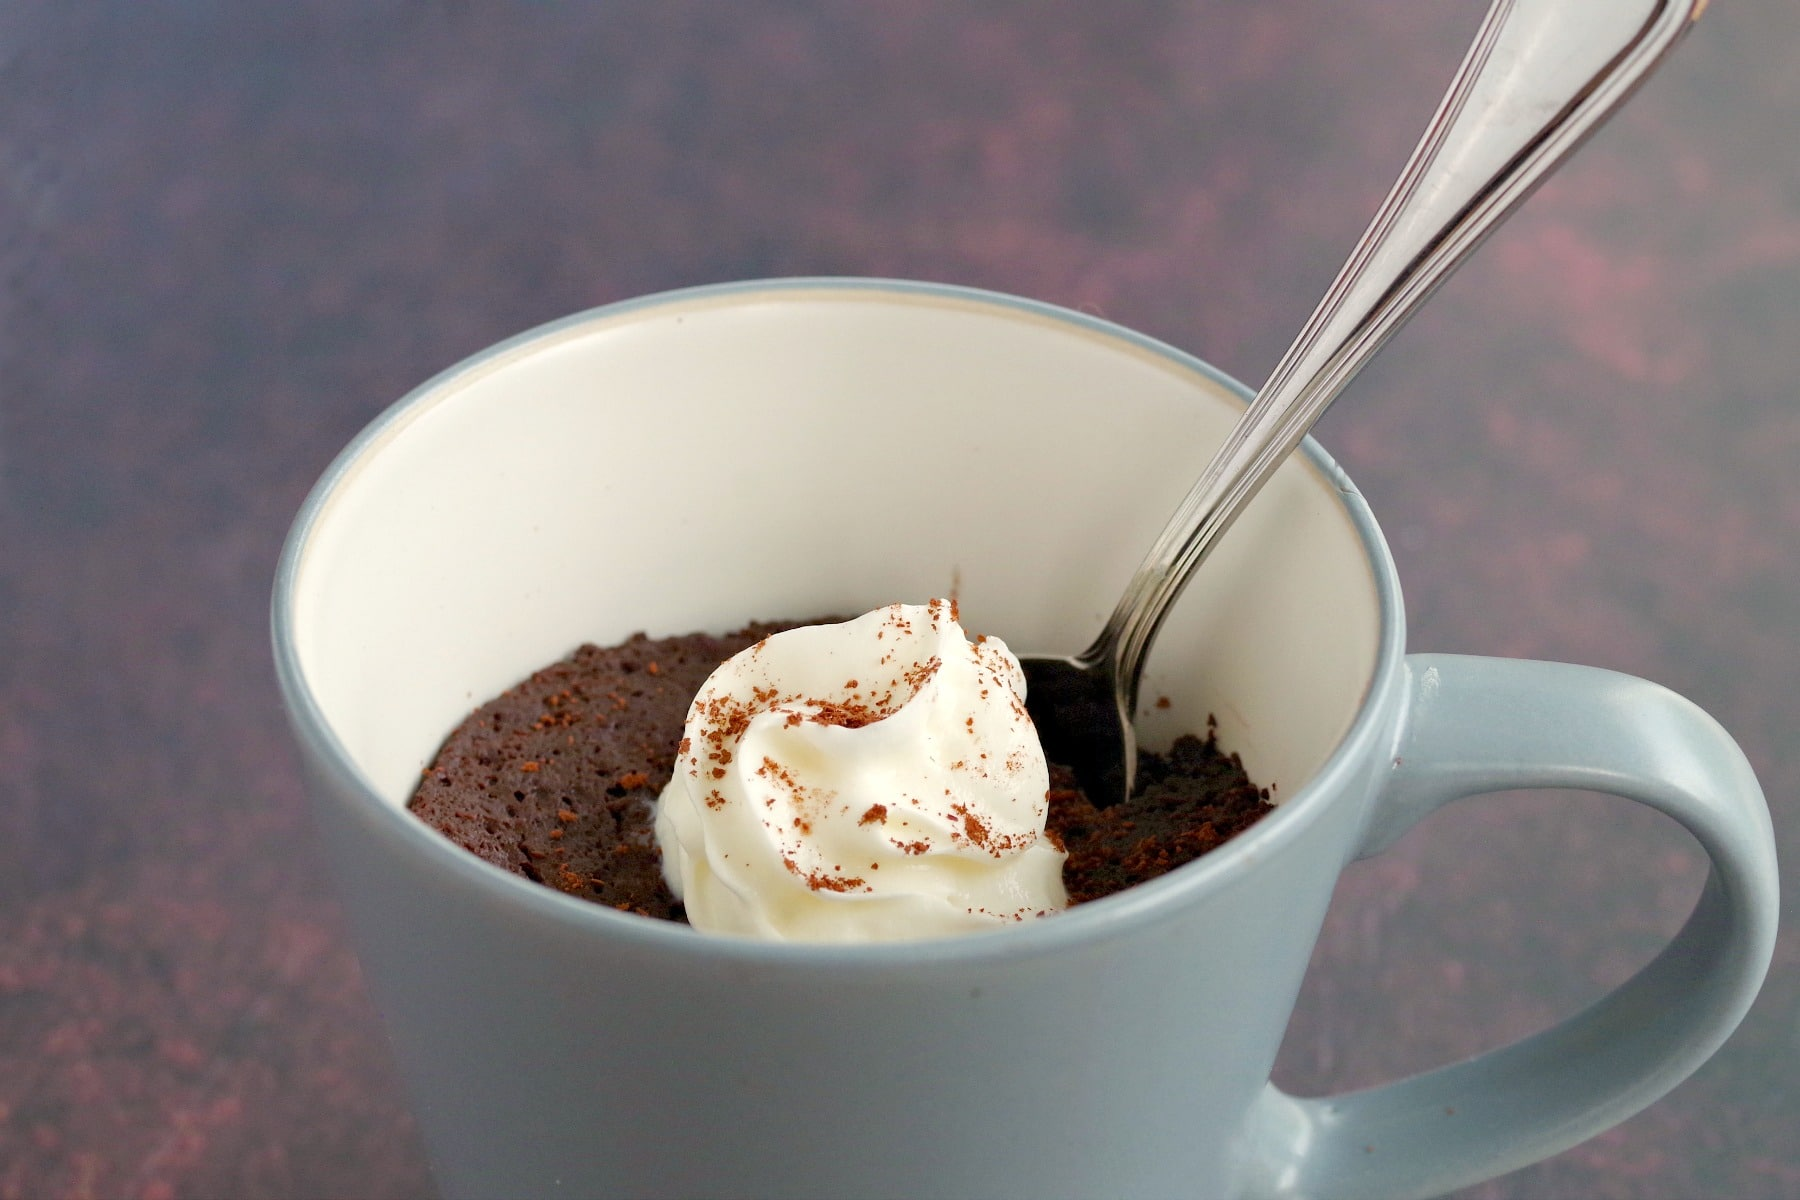 microwave chocolate banana mug cake with a spoon in it